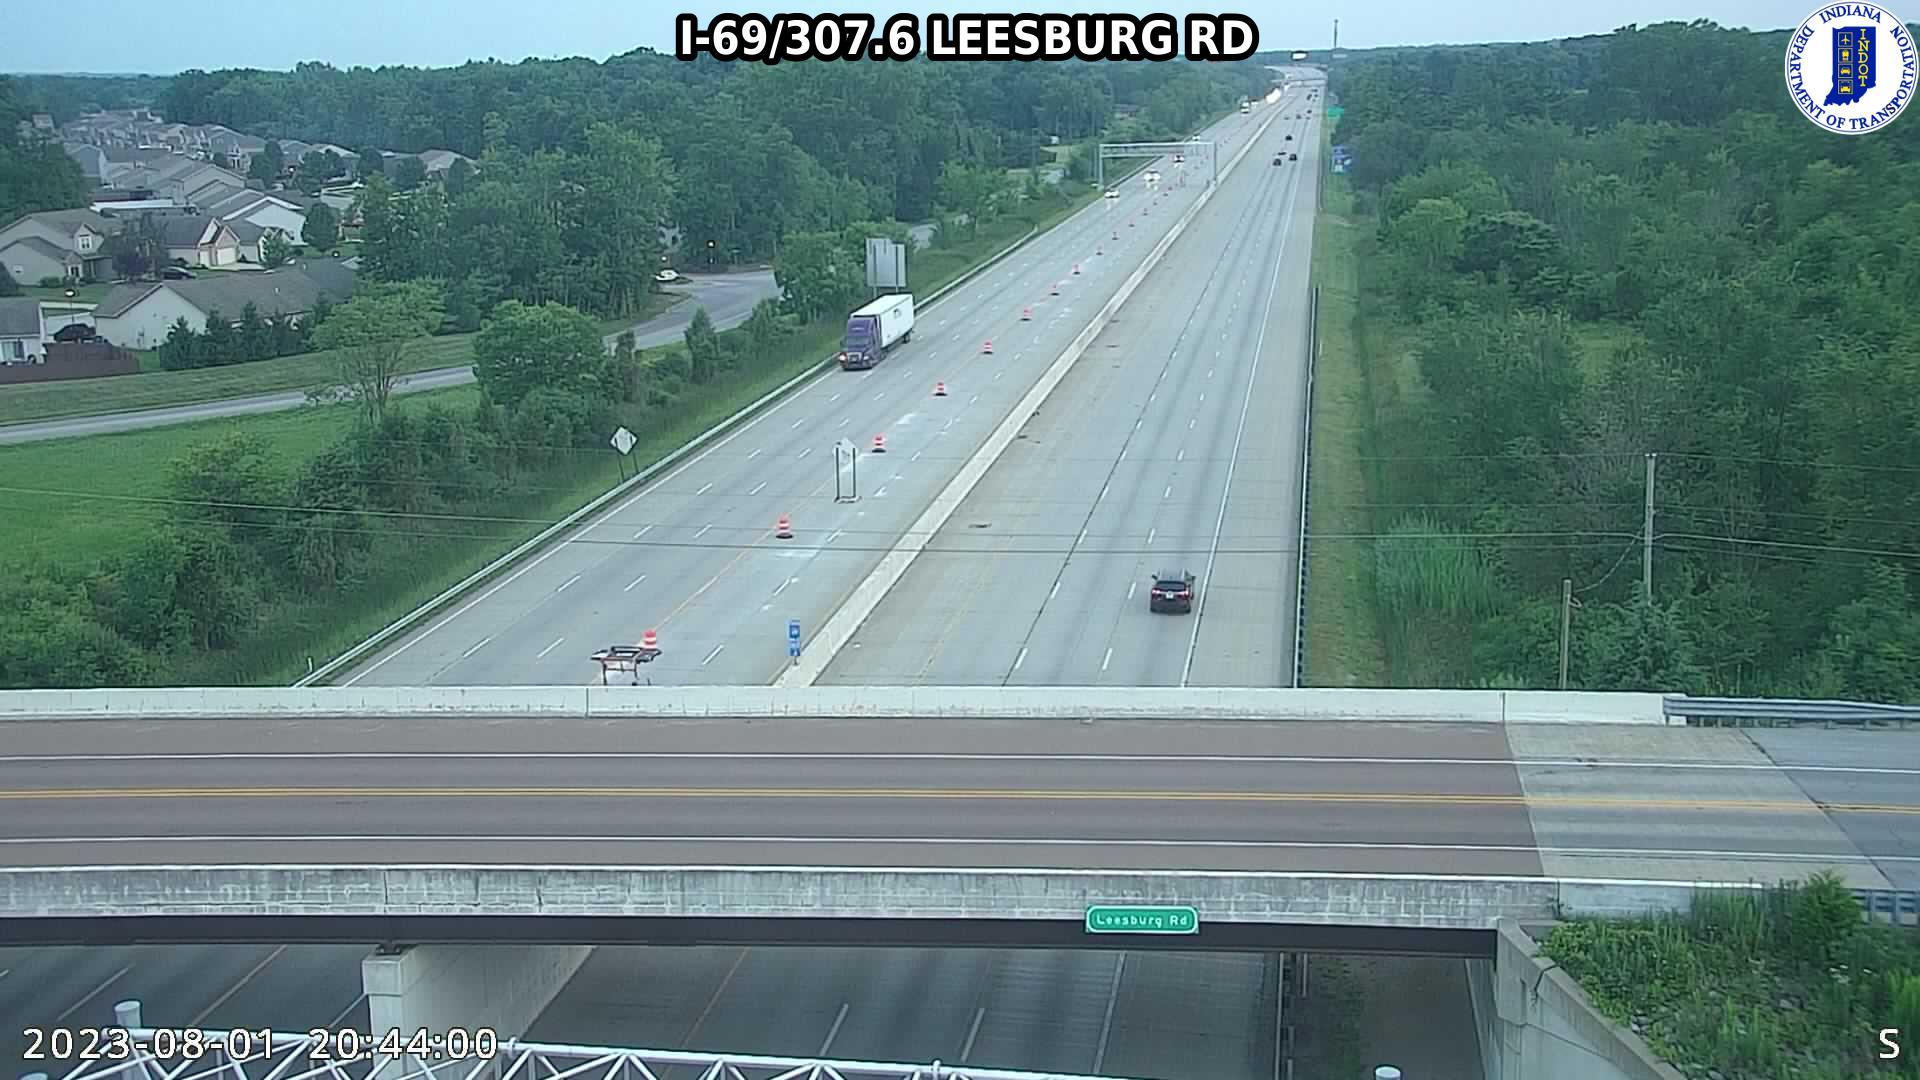 I-69 LEESBURG ROAD CAM